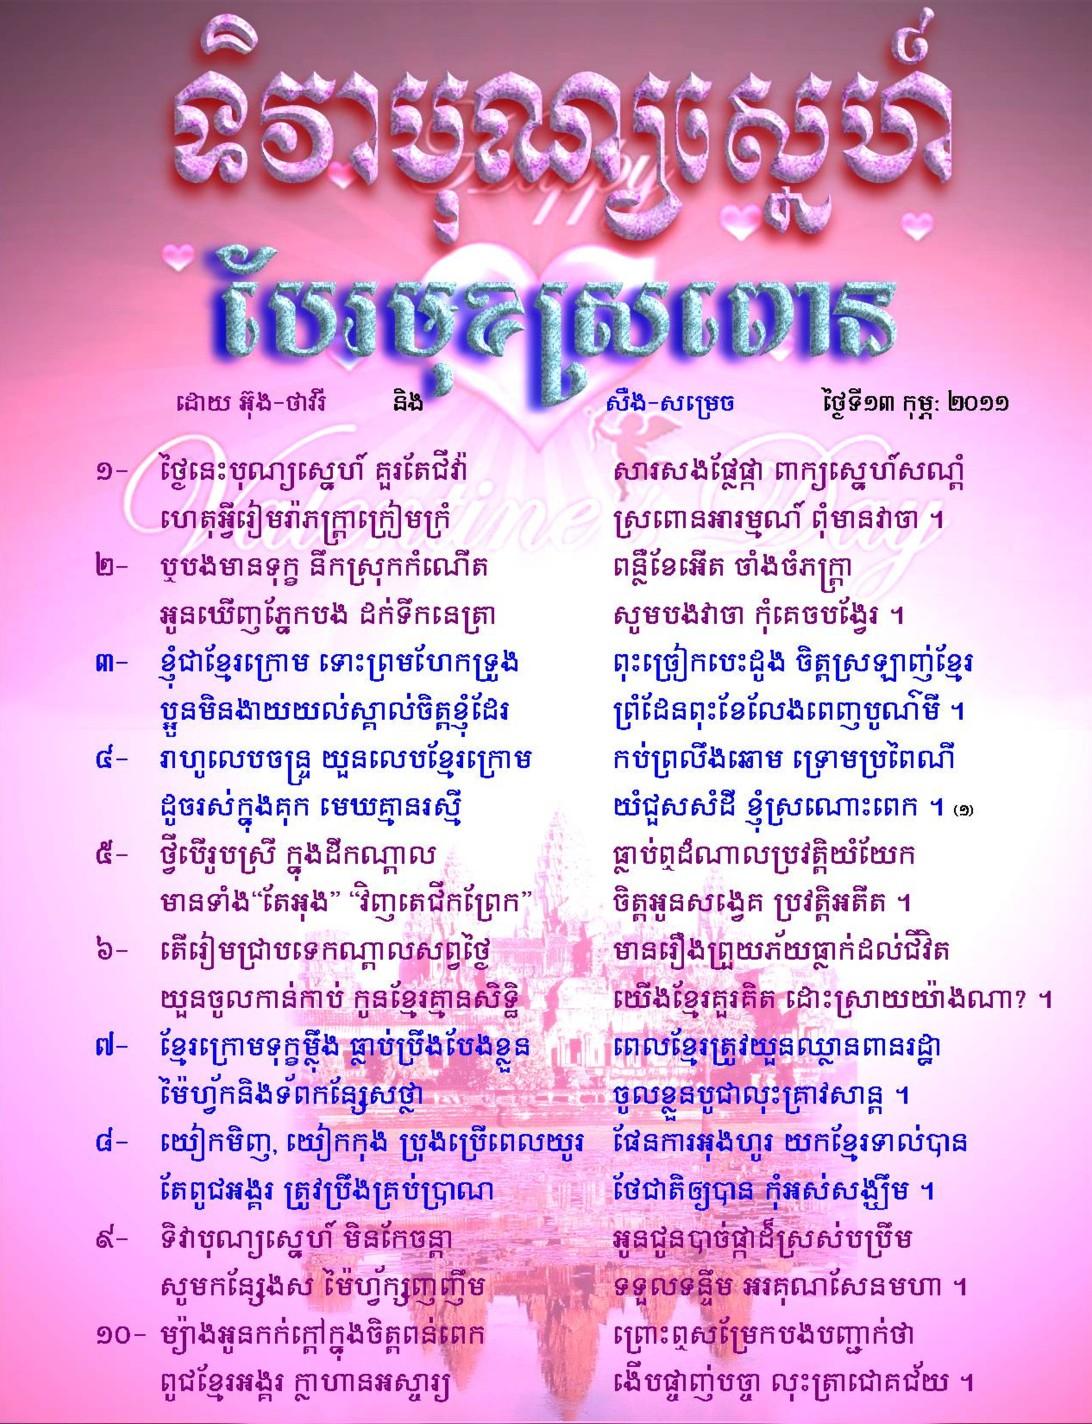 Khmer cambodia spy ki media abhisit insists on bilateral solution posted 13 feb 2011 1003 am pst malvernweather Gallery